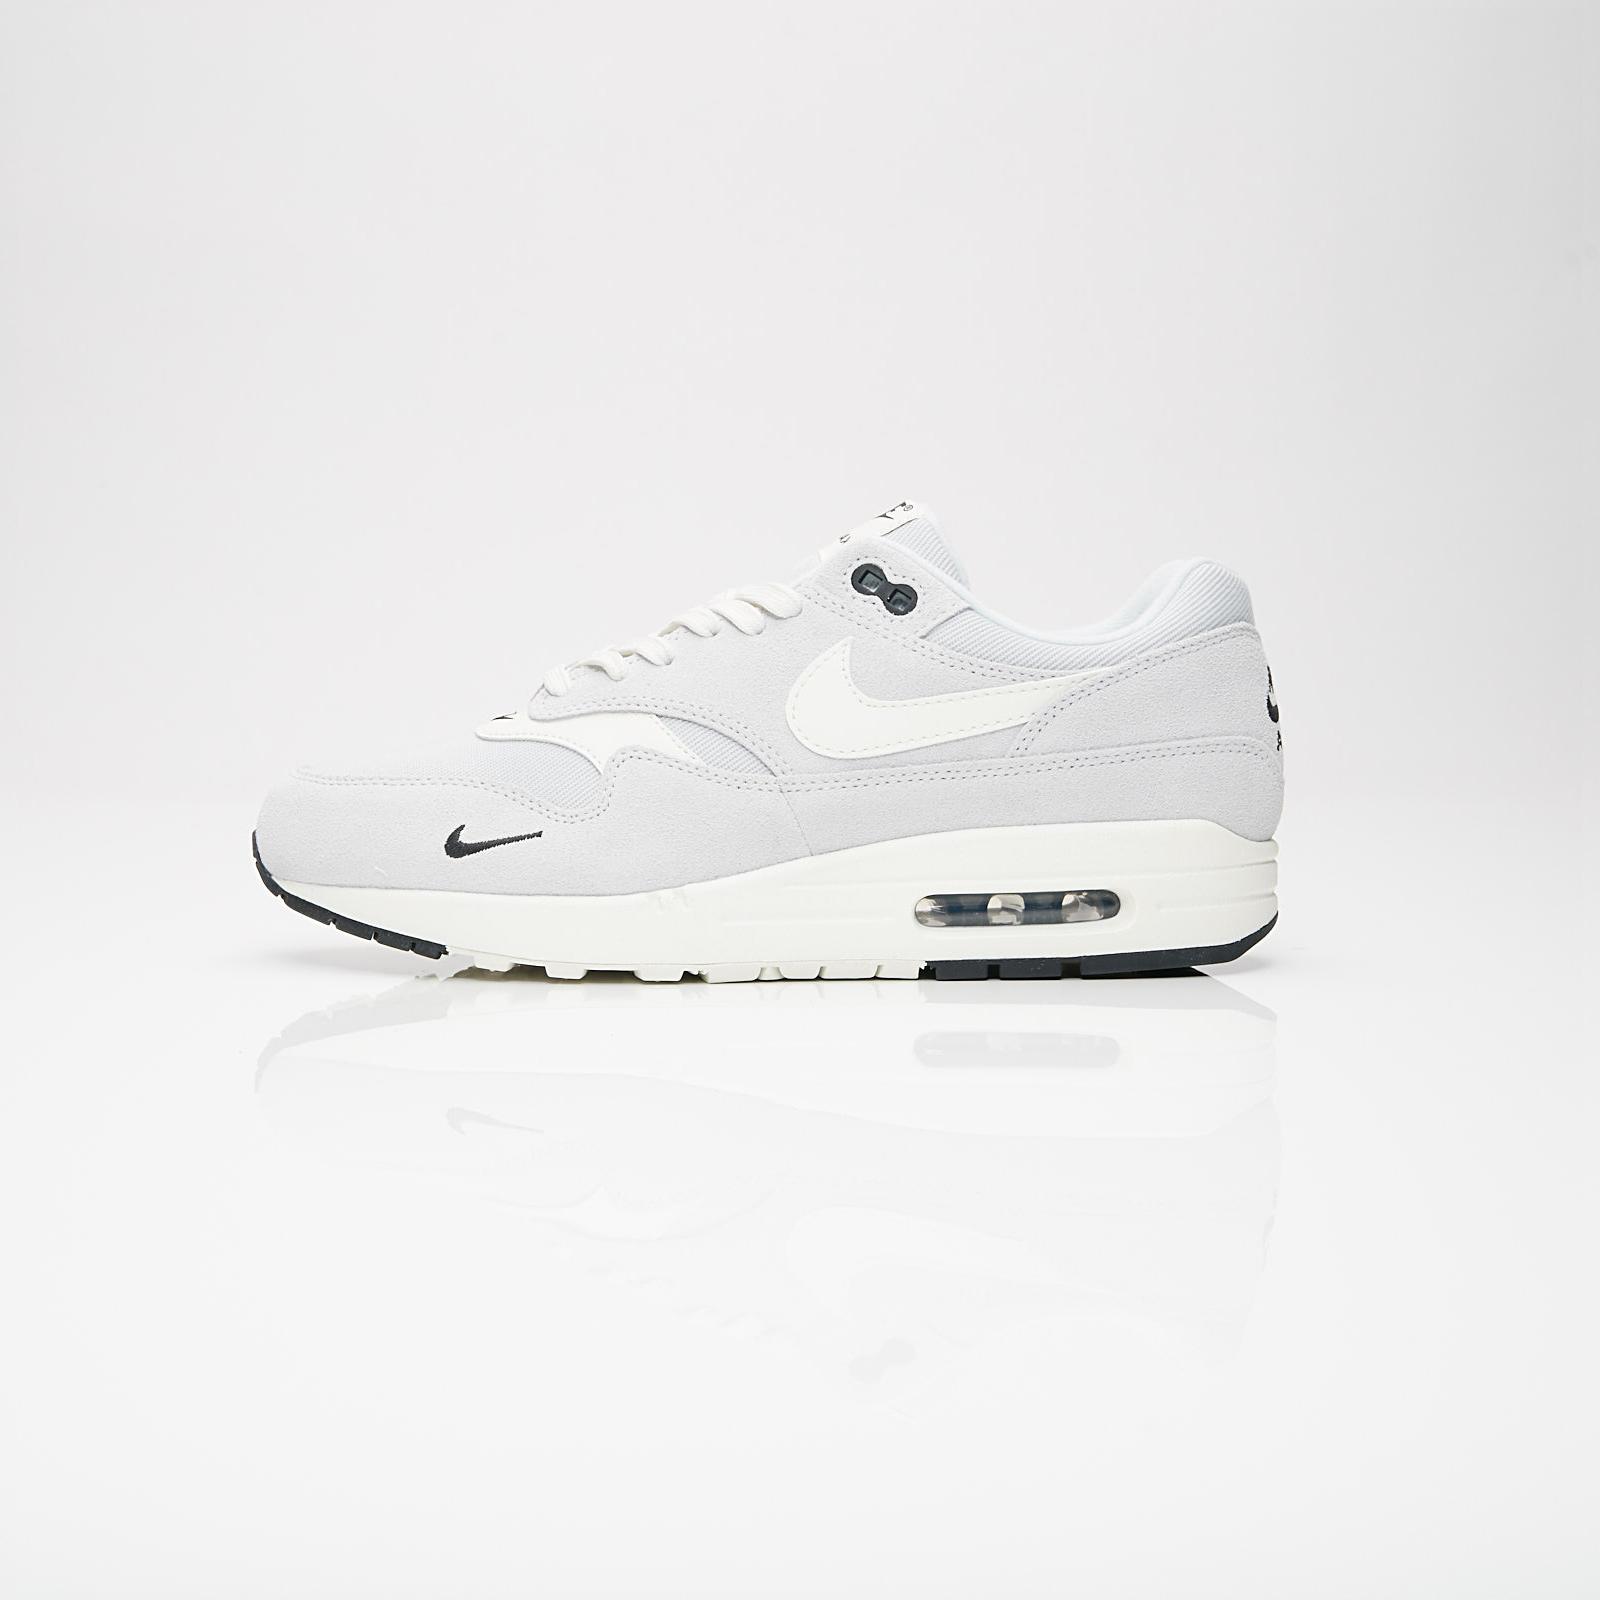 premium selection 25605 7d159 Nike Air Max 1 Premium - 875844-006 - Sneakersnstuff   sneakers    streetwear online since 1999